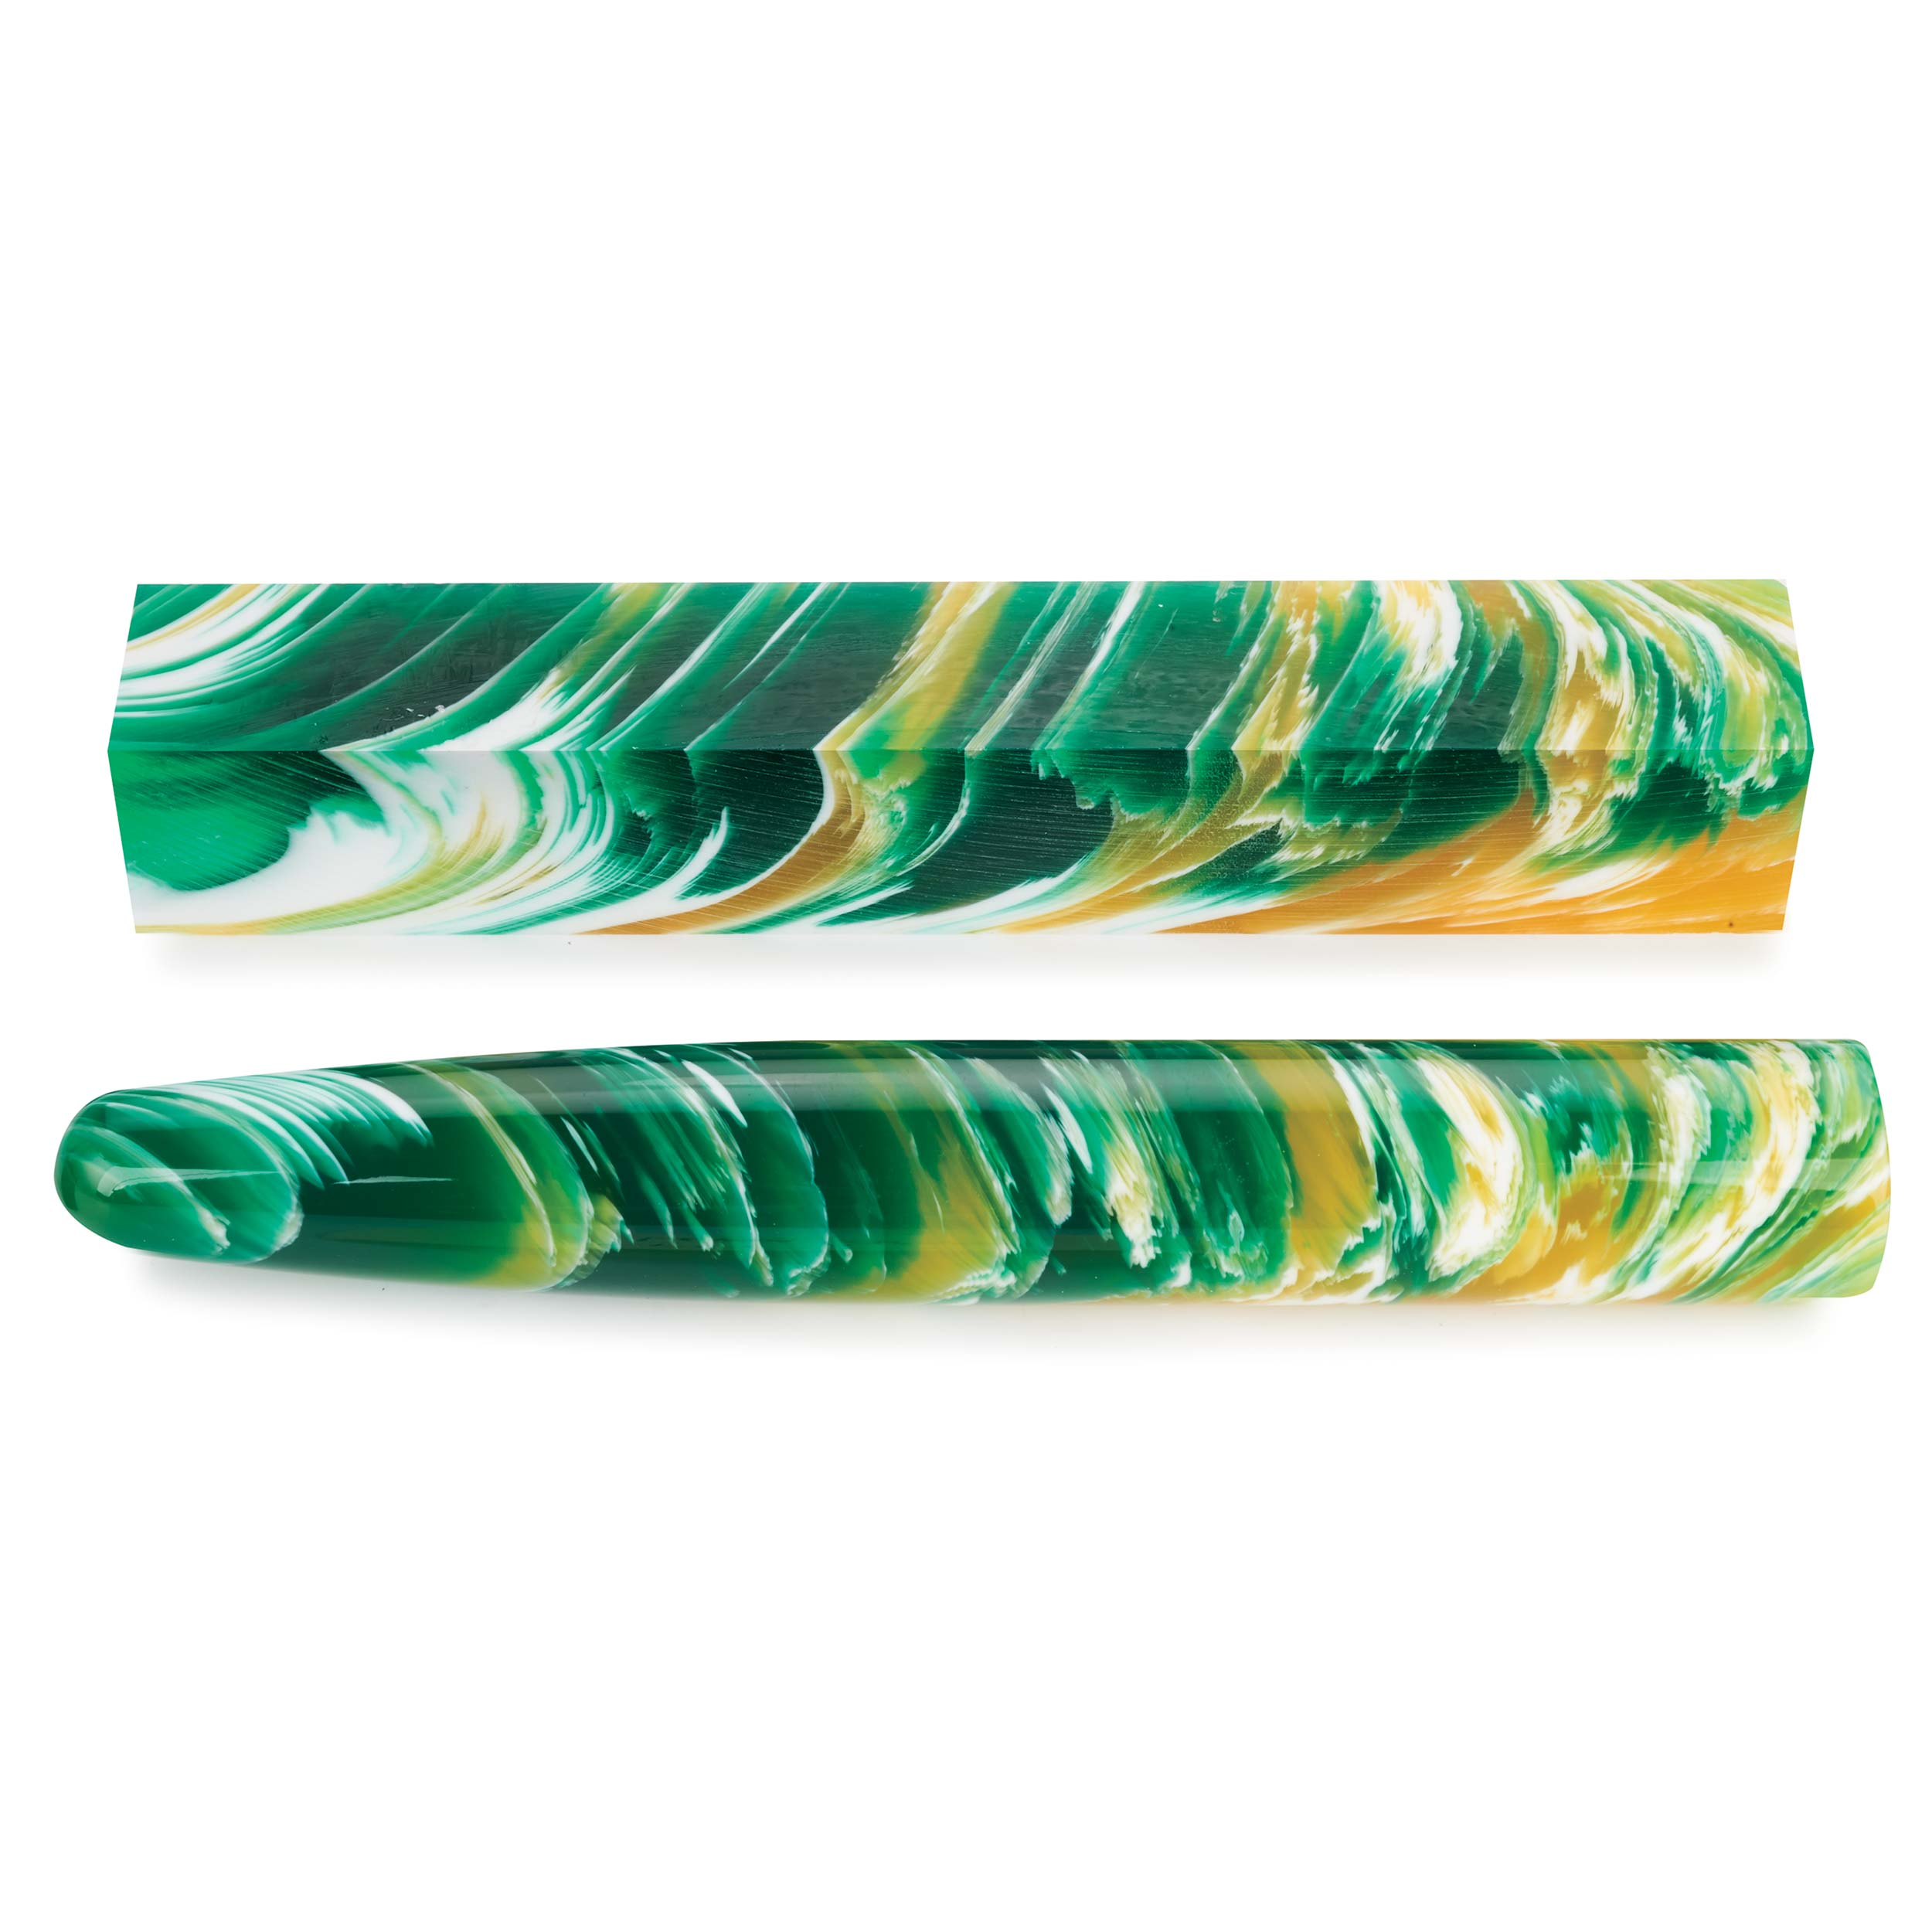 Acrylic Poly Resin Pen Blank - Lemon Grass